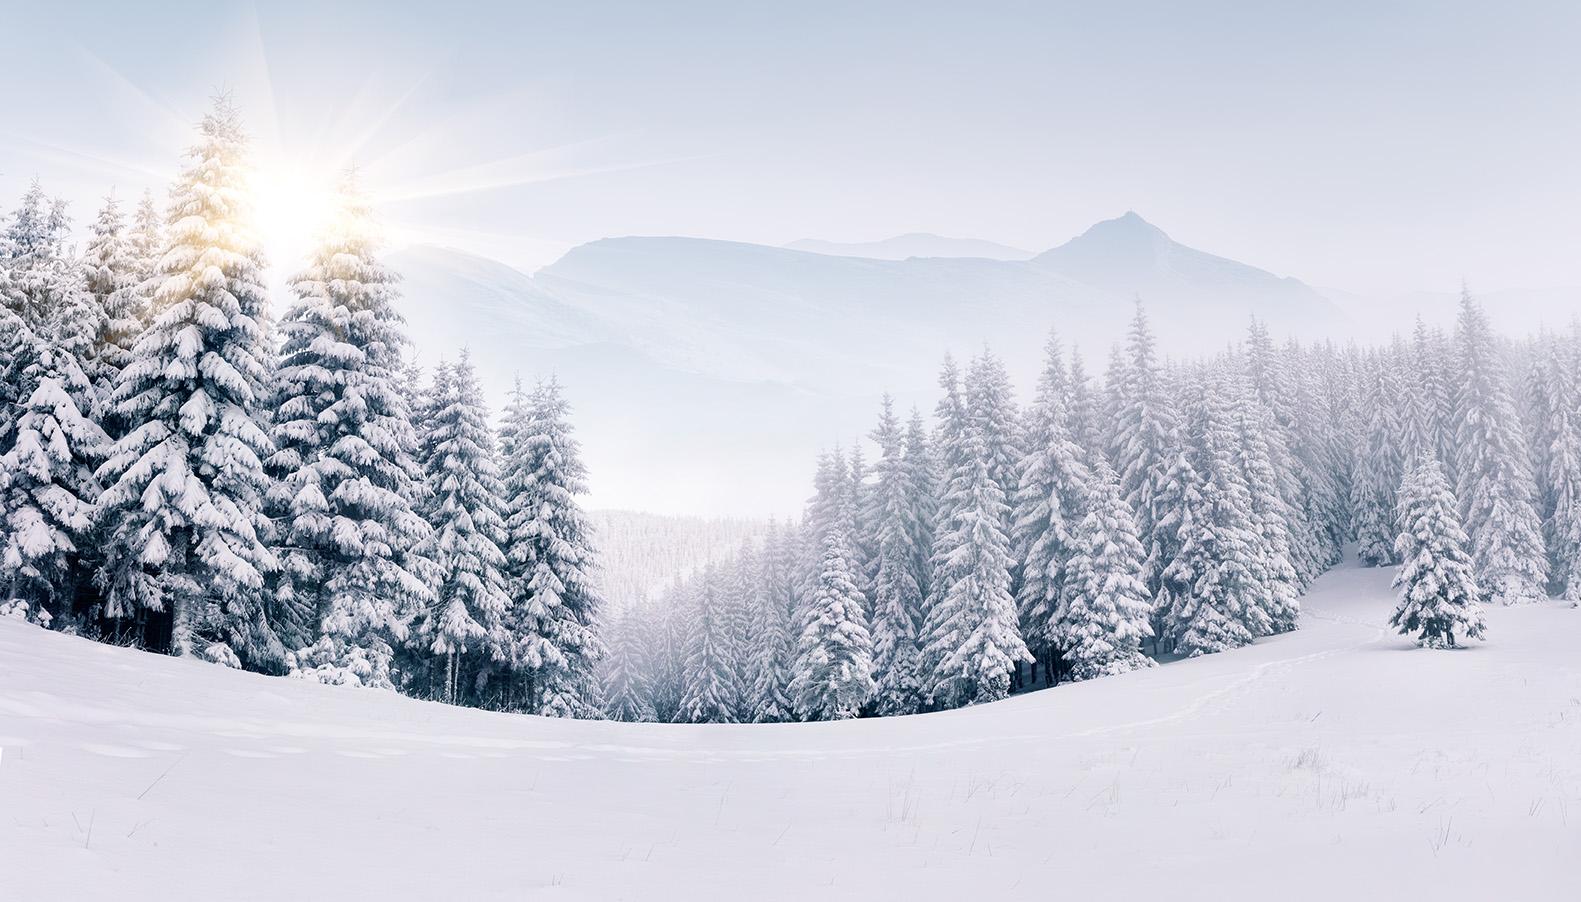 winter-landscape-snow-zima-6037